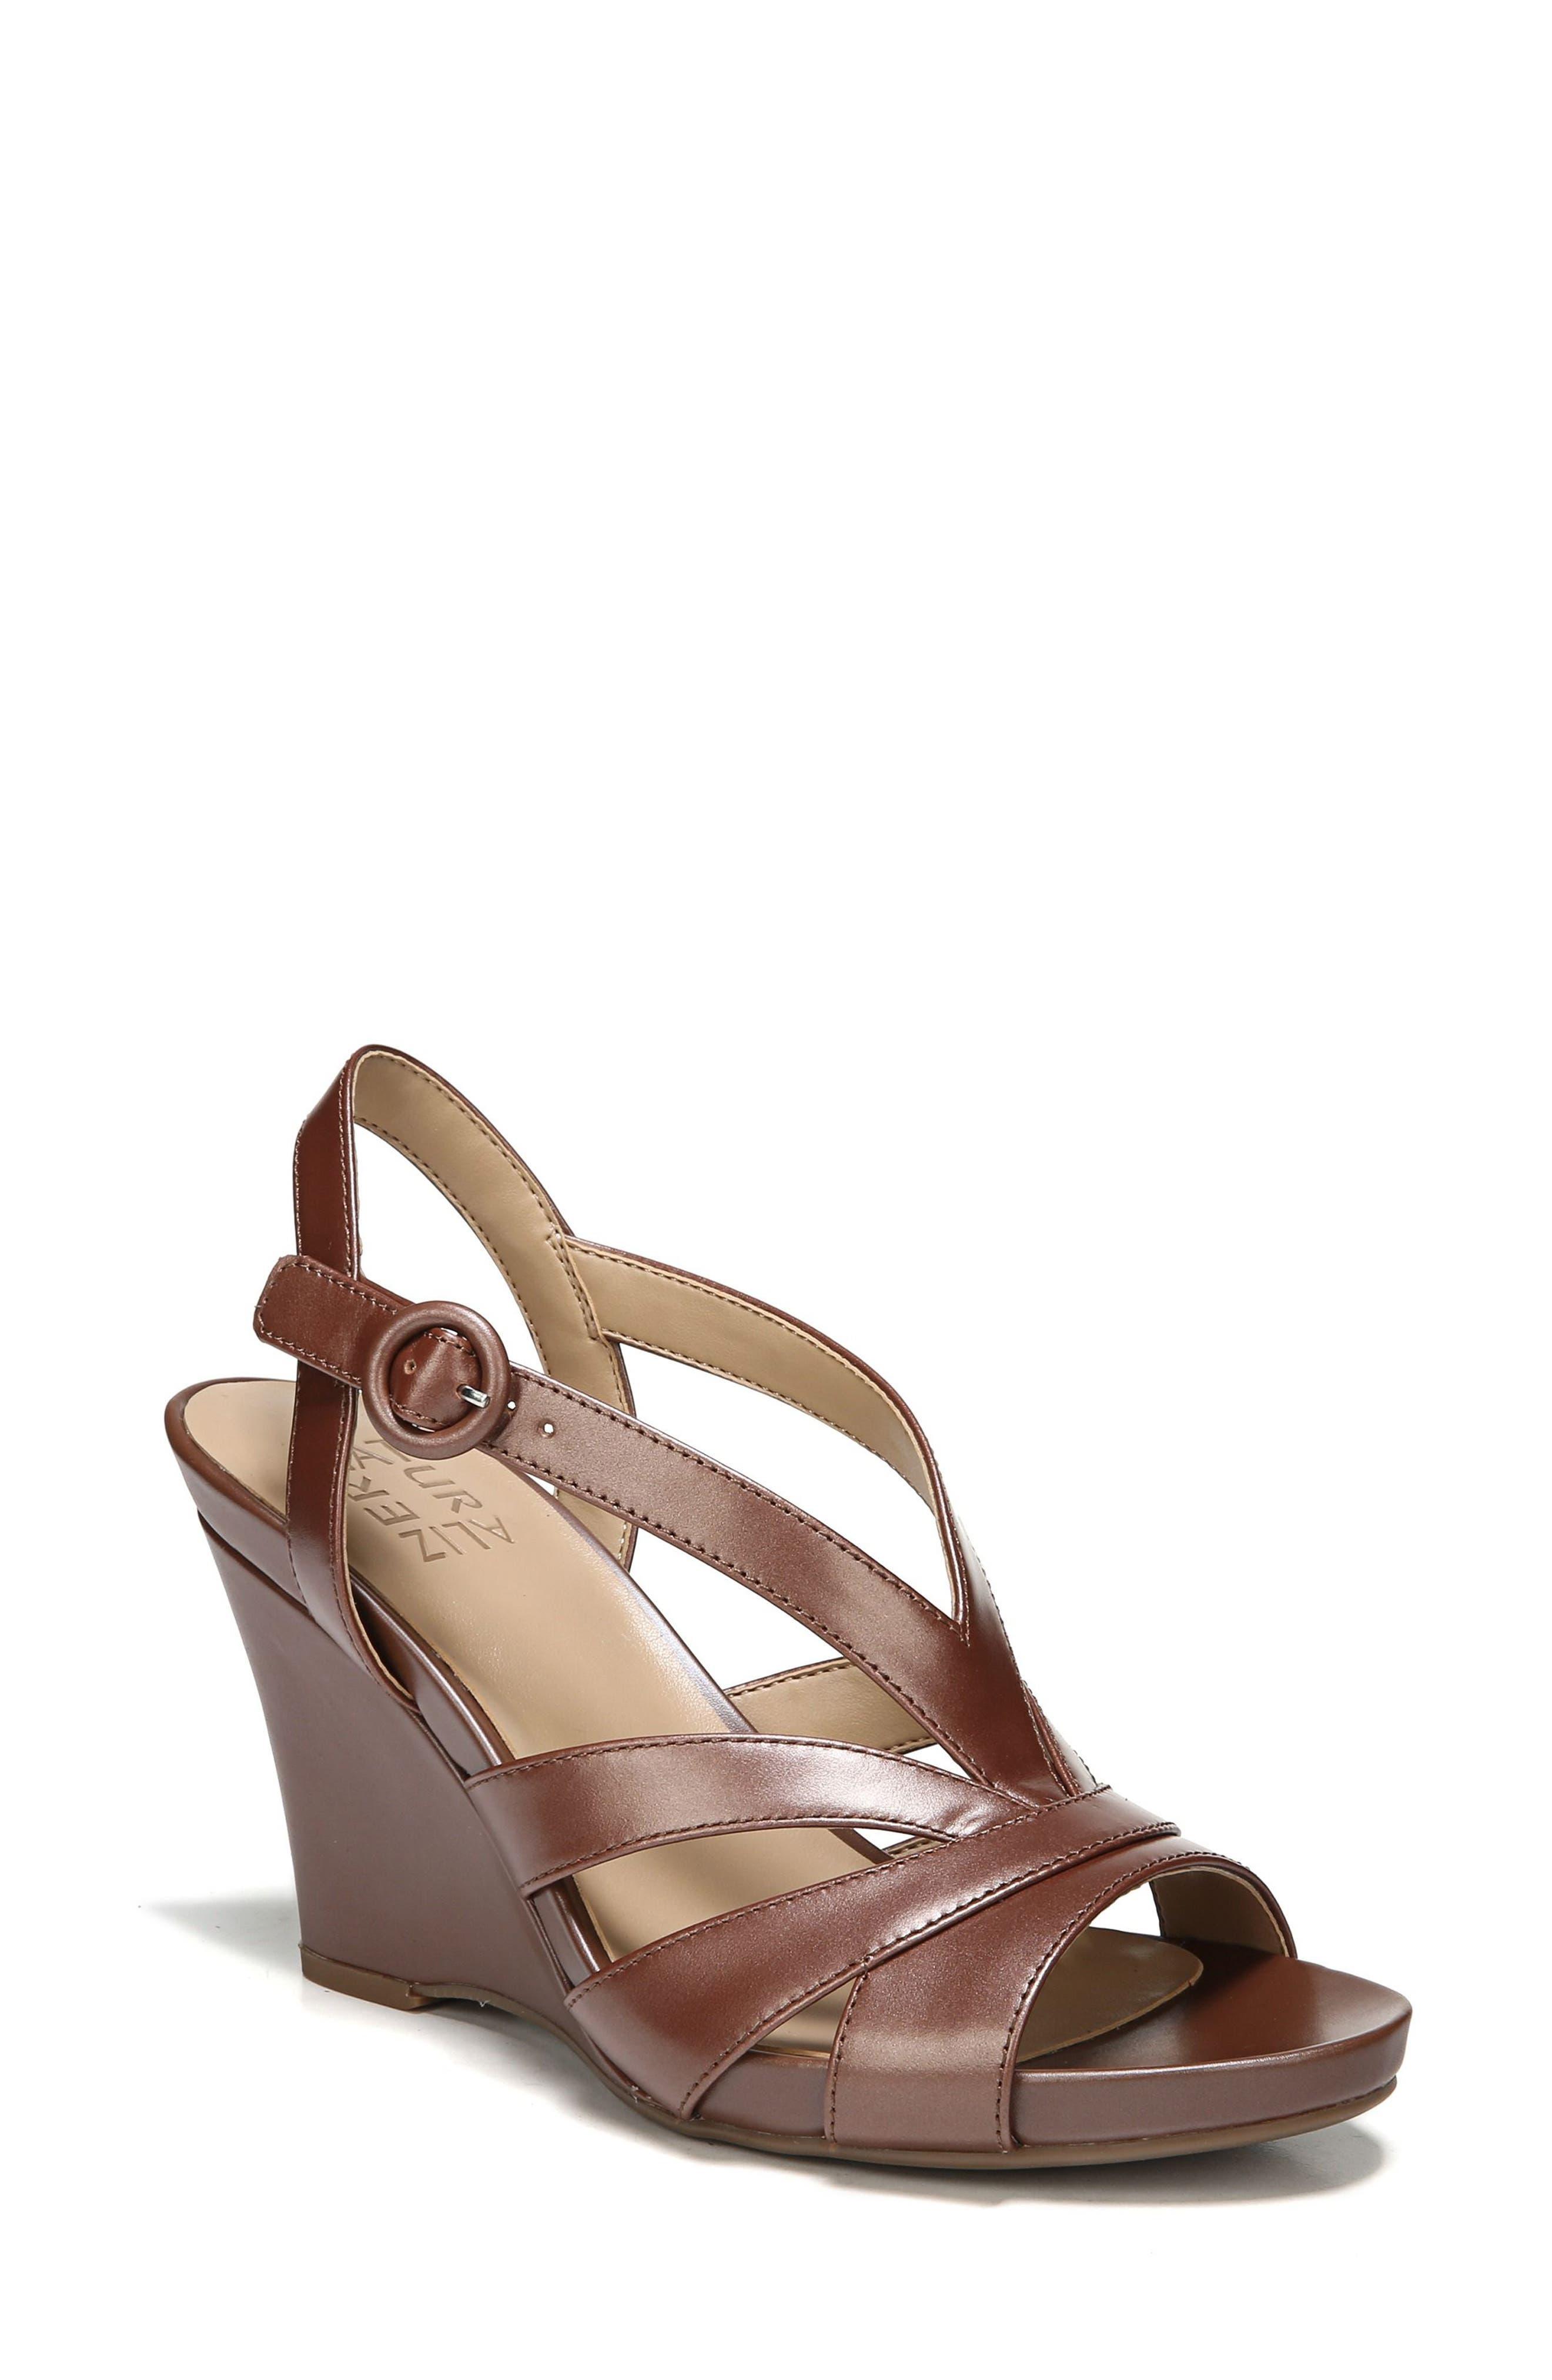 Main Image - Naturalizer Brandy Wedge Sandal (Women)